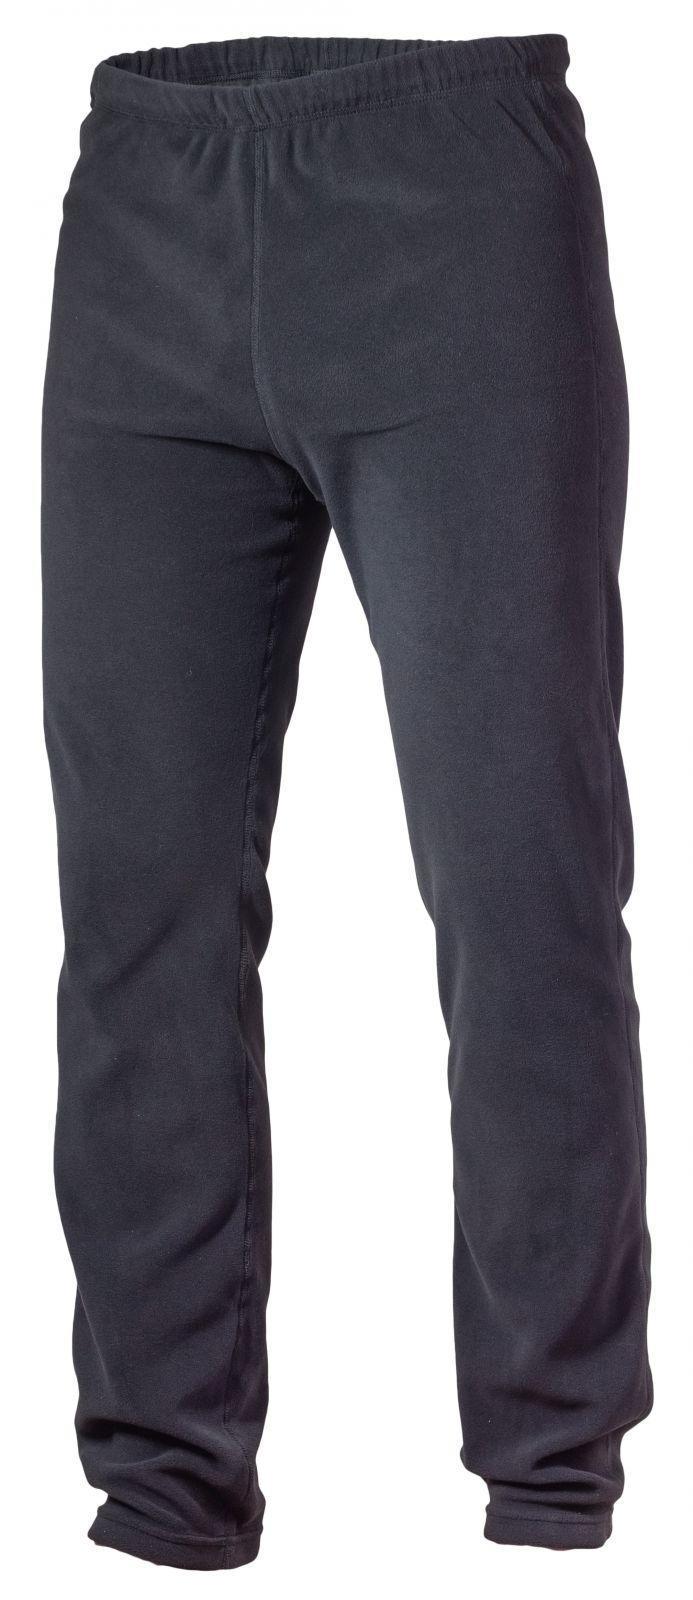 Outdoorix - Warmpeace Jive black kalhoty z Polartec Micro